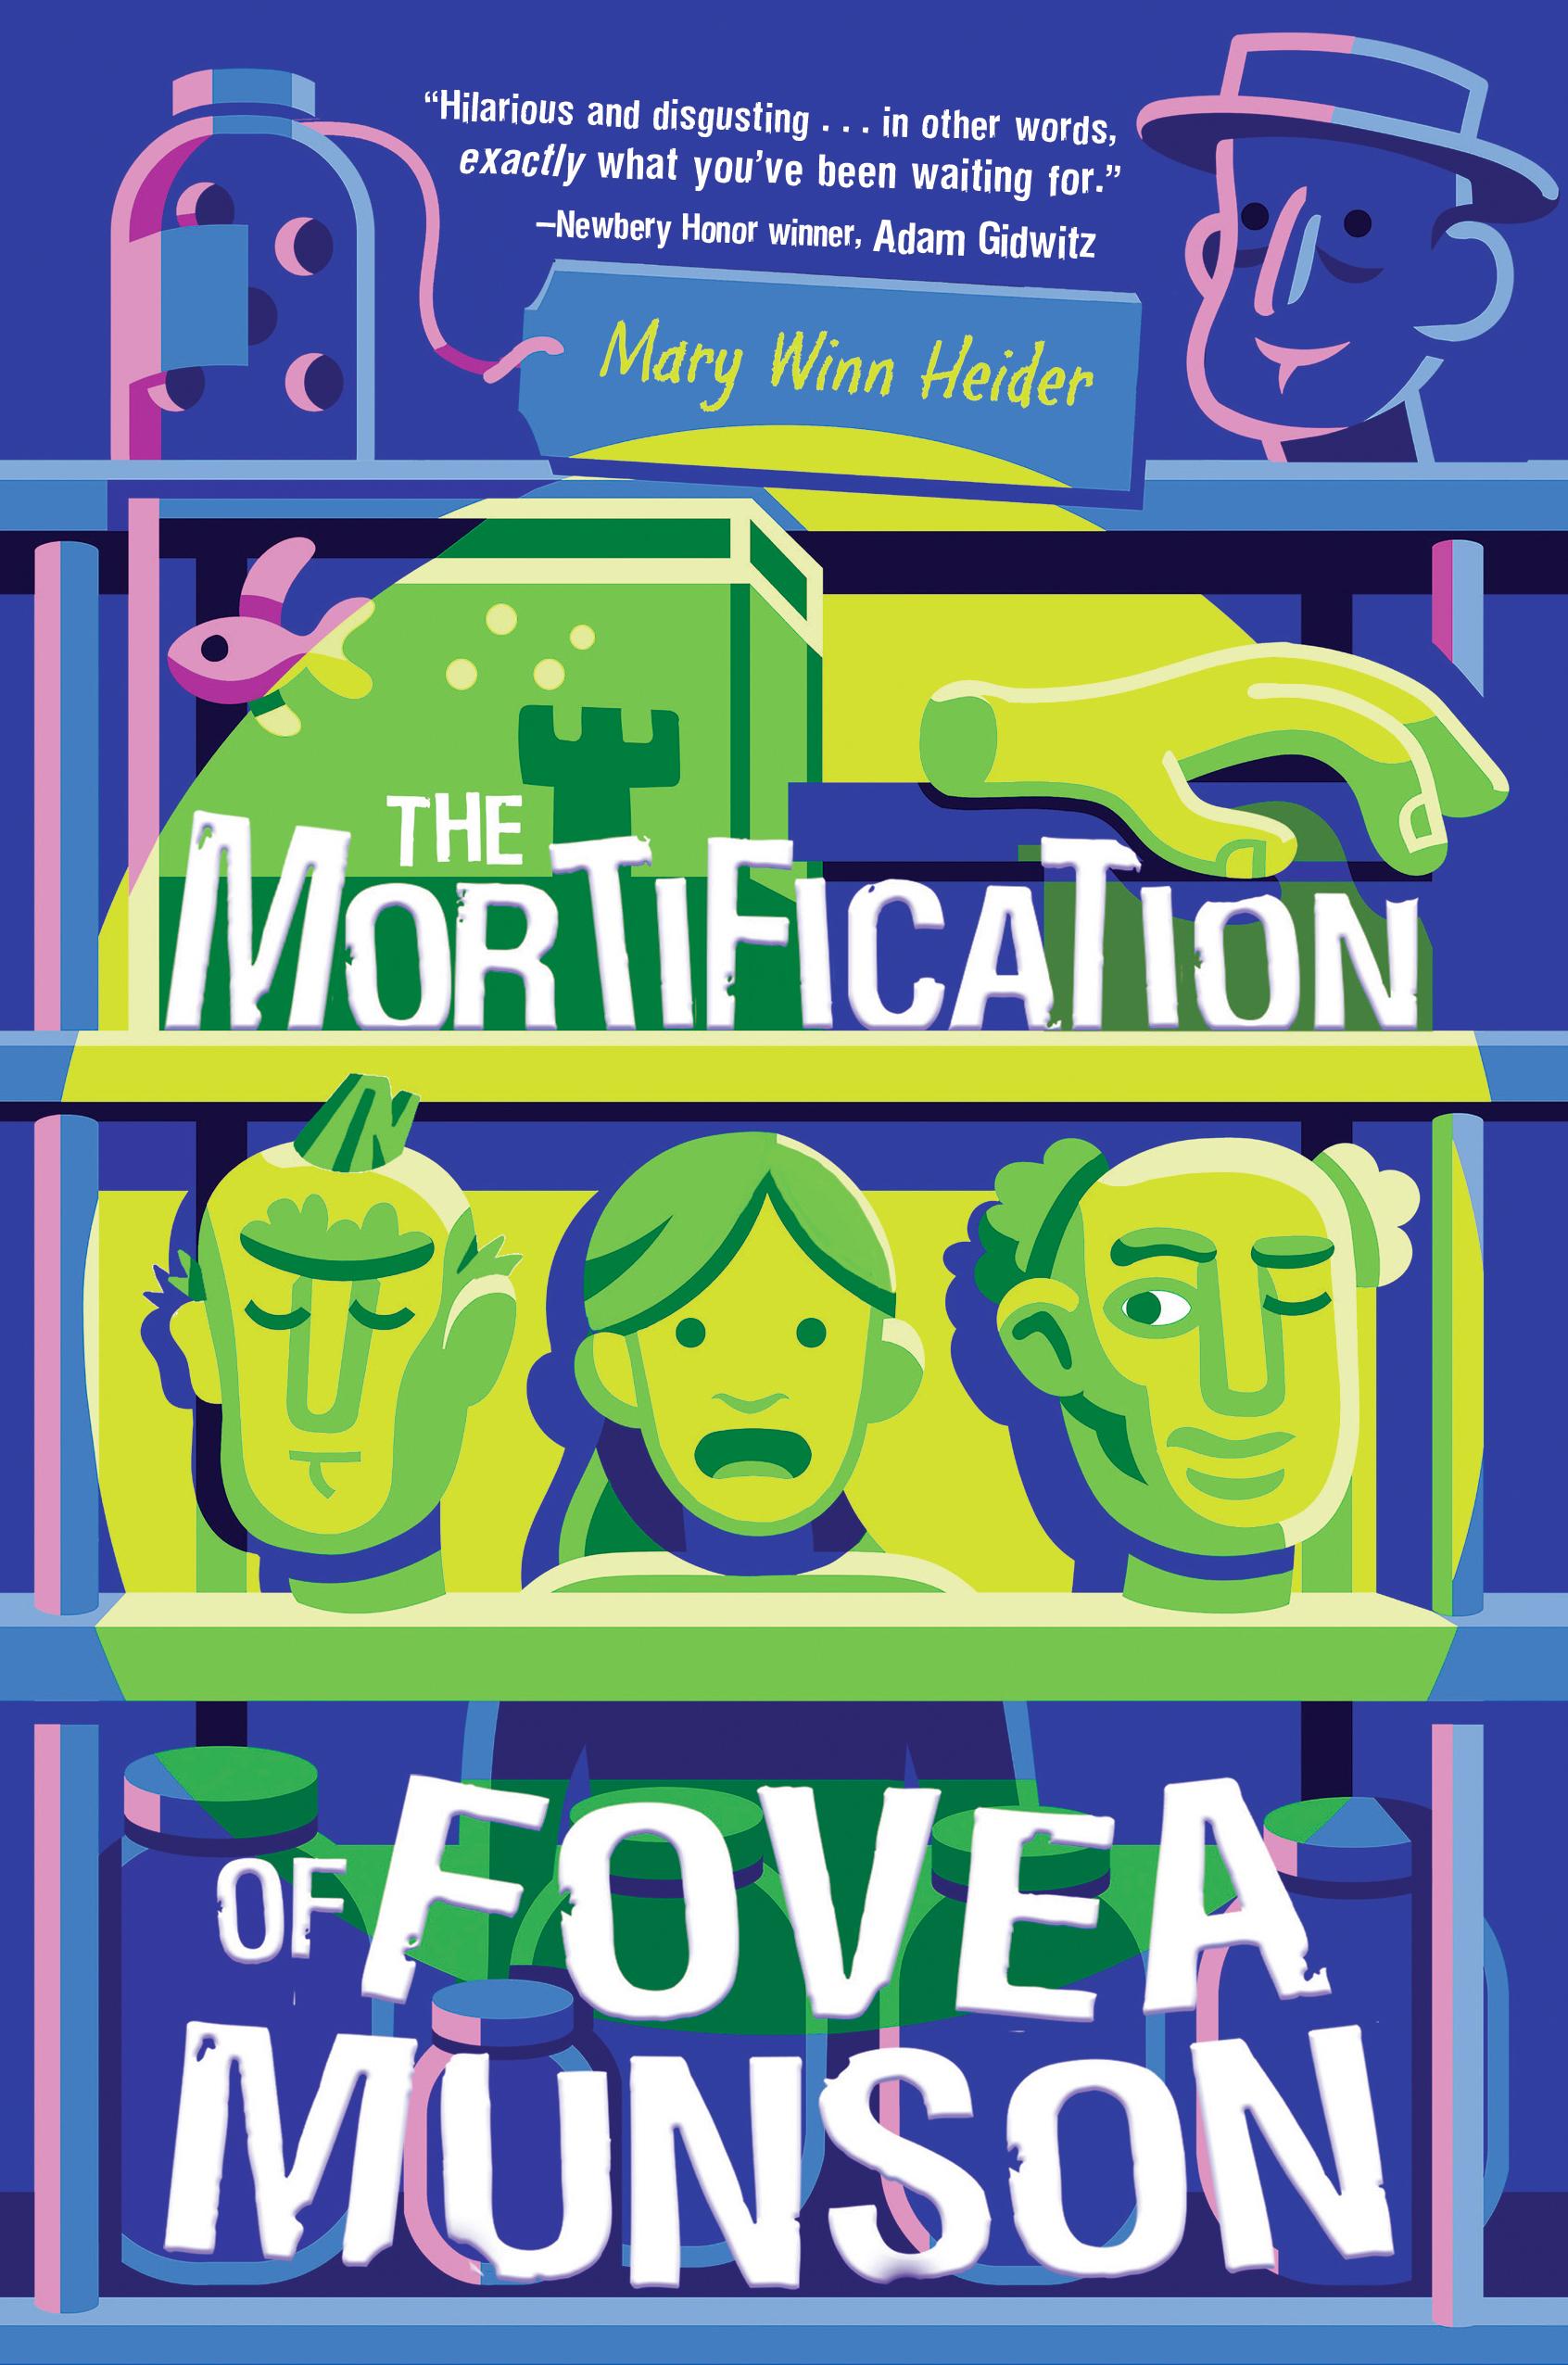 Mortification_of_Fovea_Munson